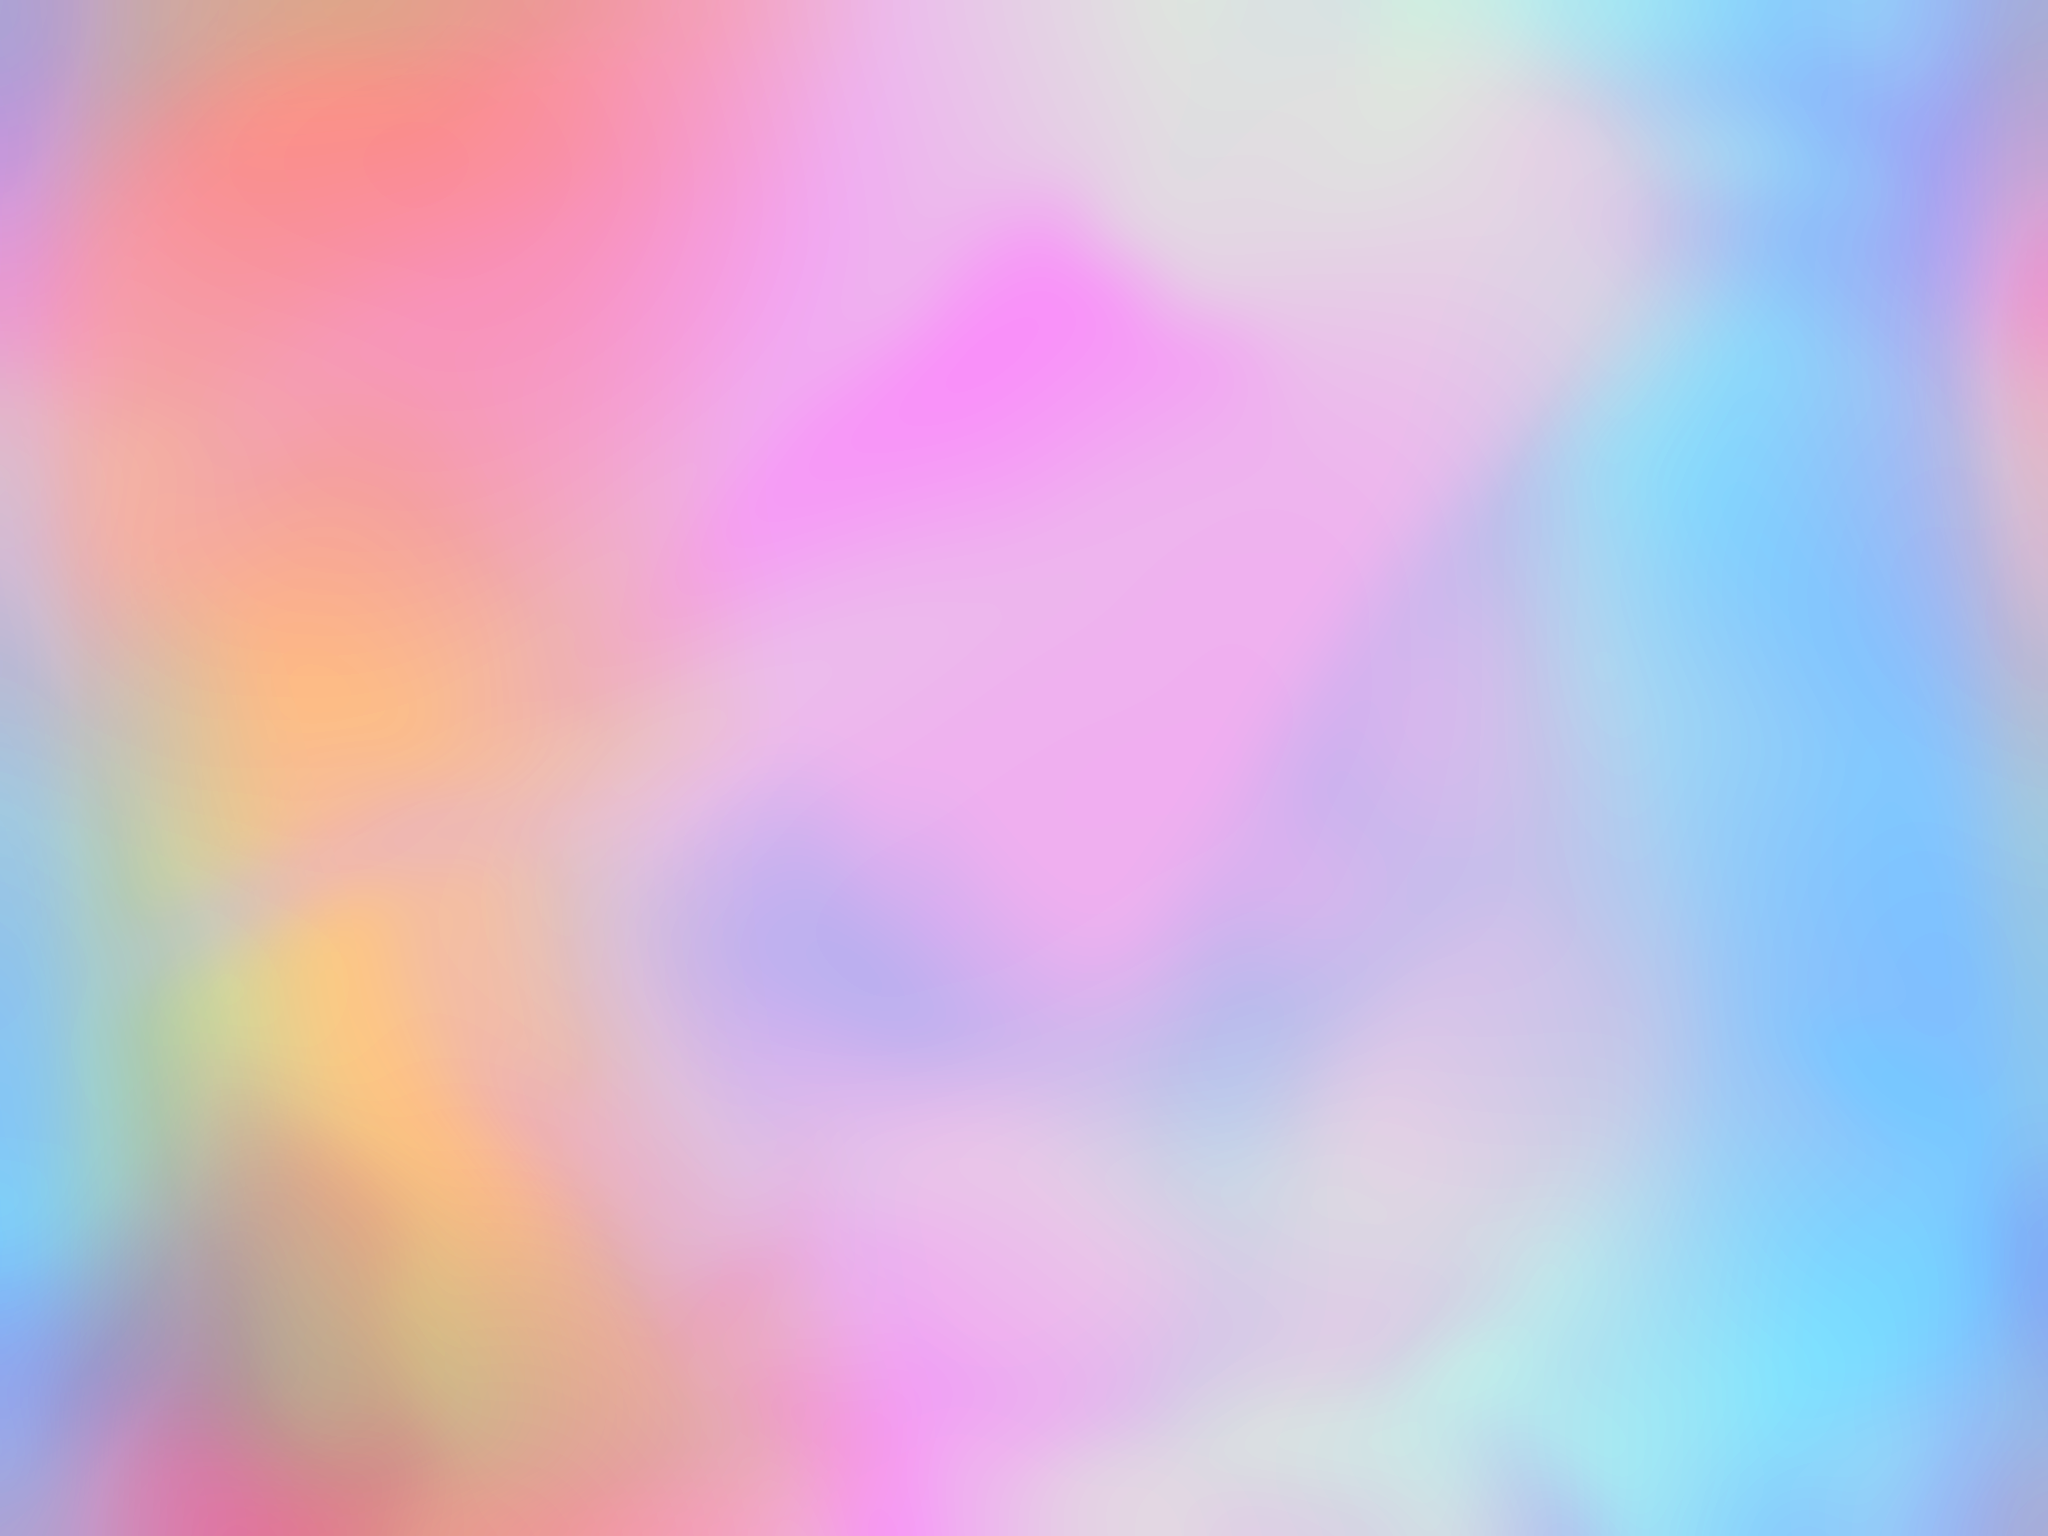 Ipad Retina Wallpaper Abstrait 2 Fond D Ecran Pour Ecrire 3230406 Hd Wallpaper Backgrounds Download